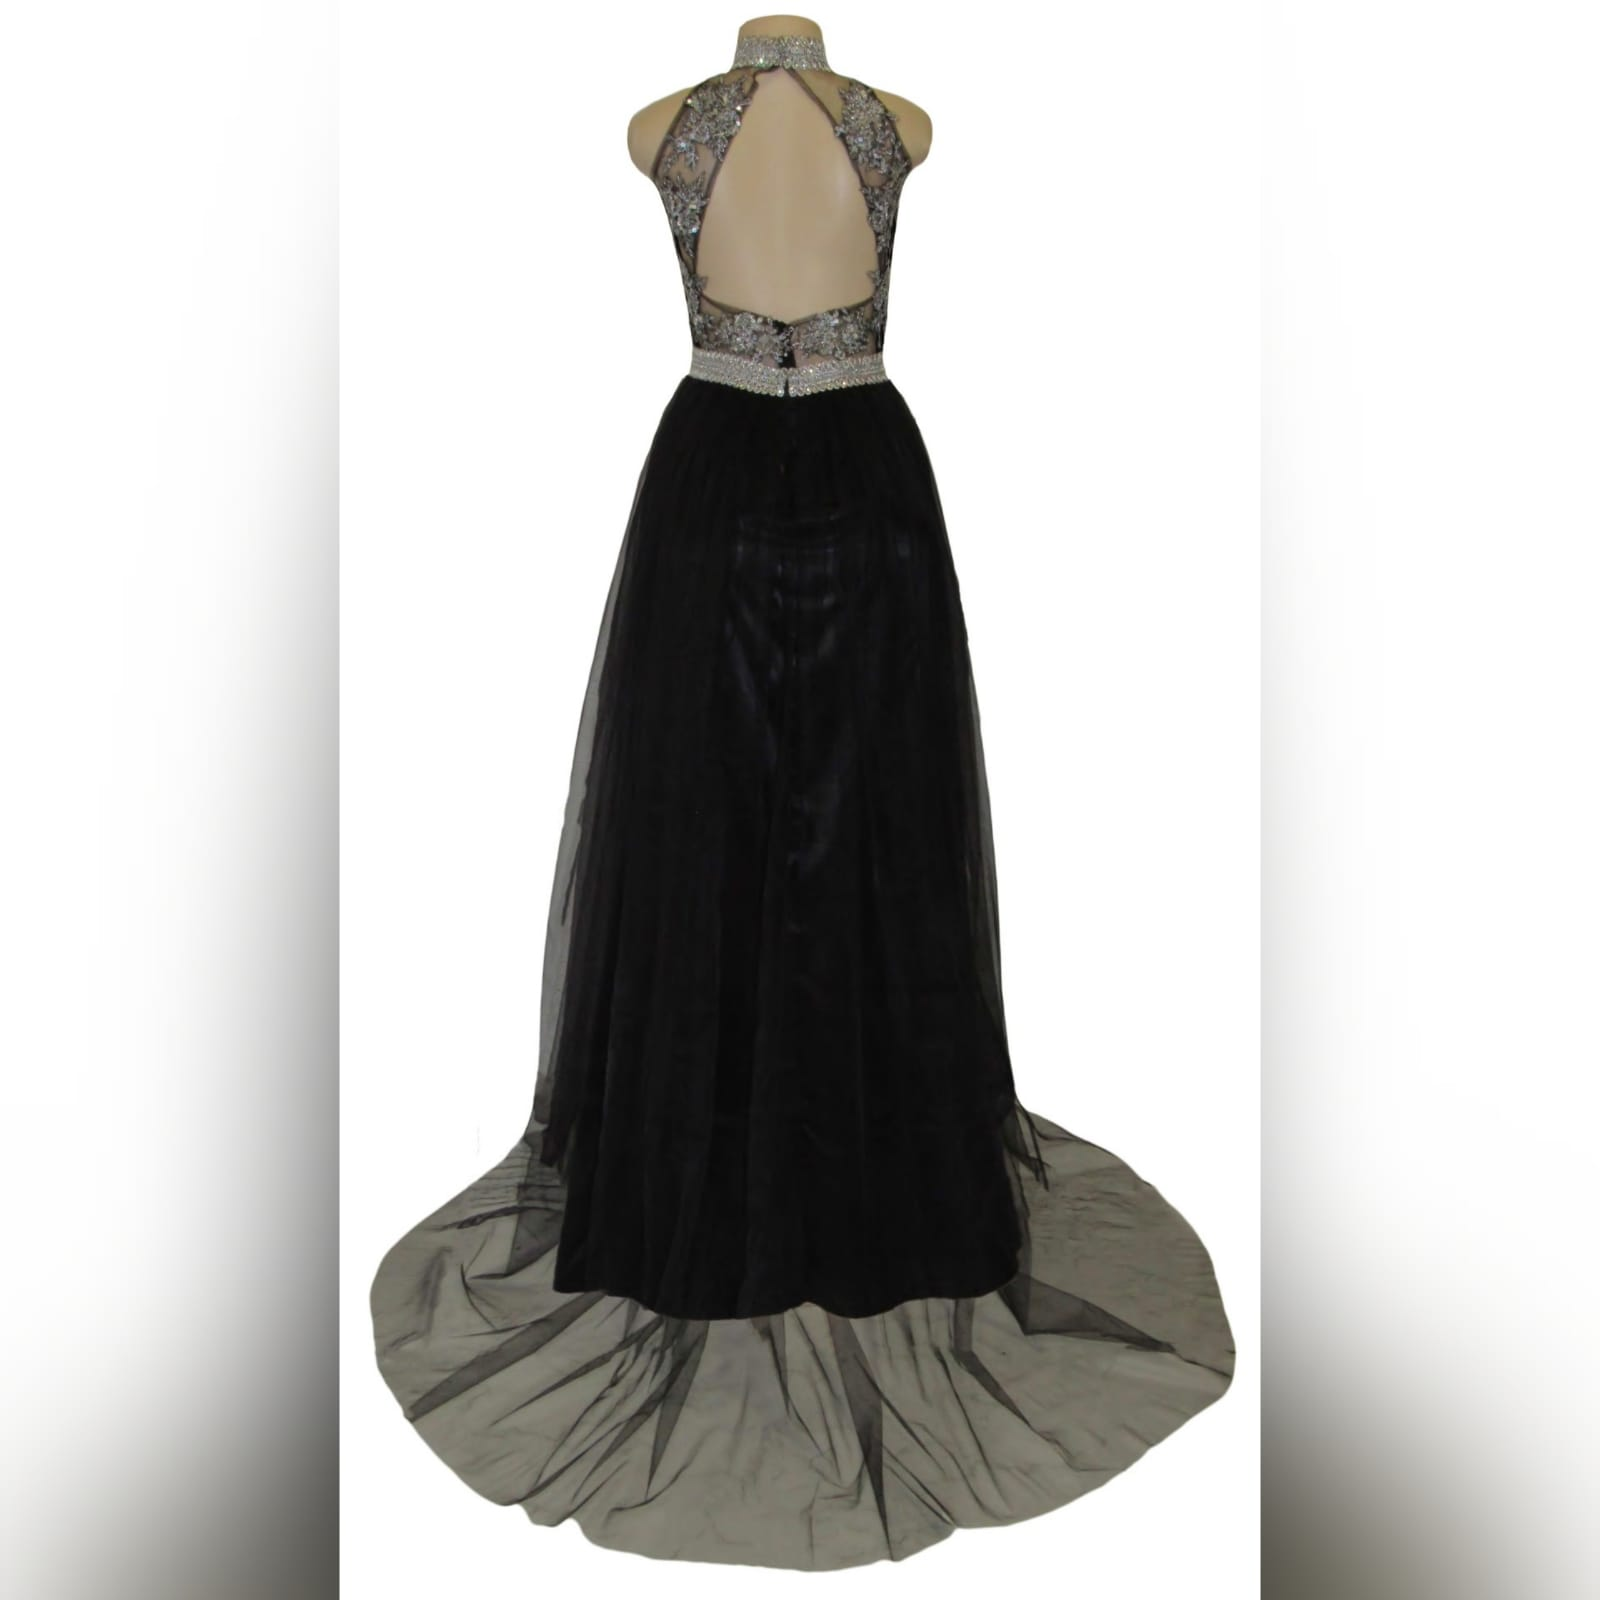 Black & silver long elegant prom dress 4 black & silver, long & elegant prom dance dress with a triangular open back. Choker neckline and an under bust bling belt with train.